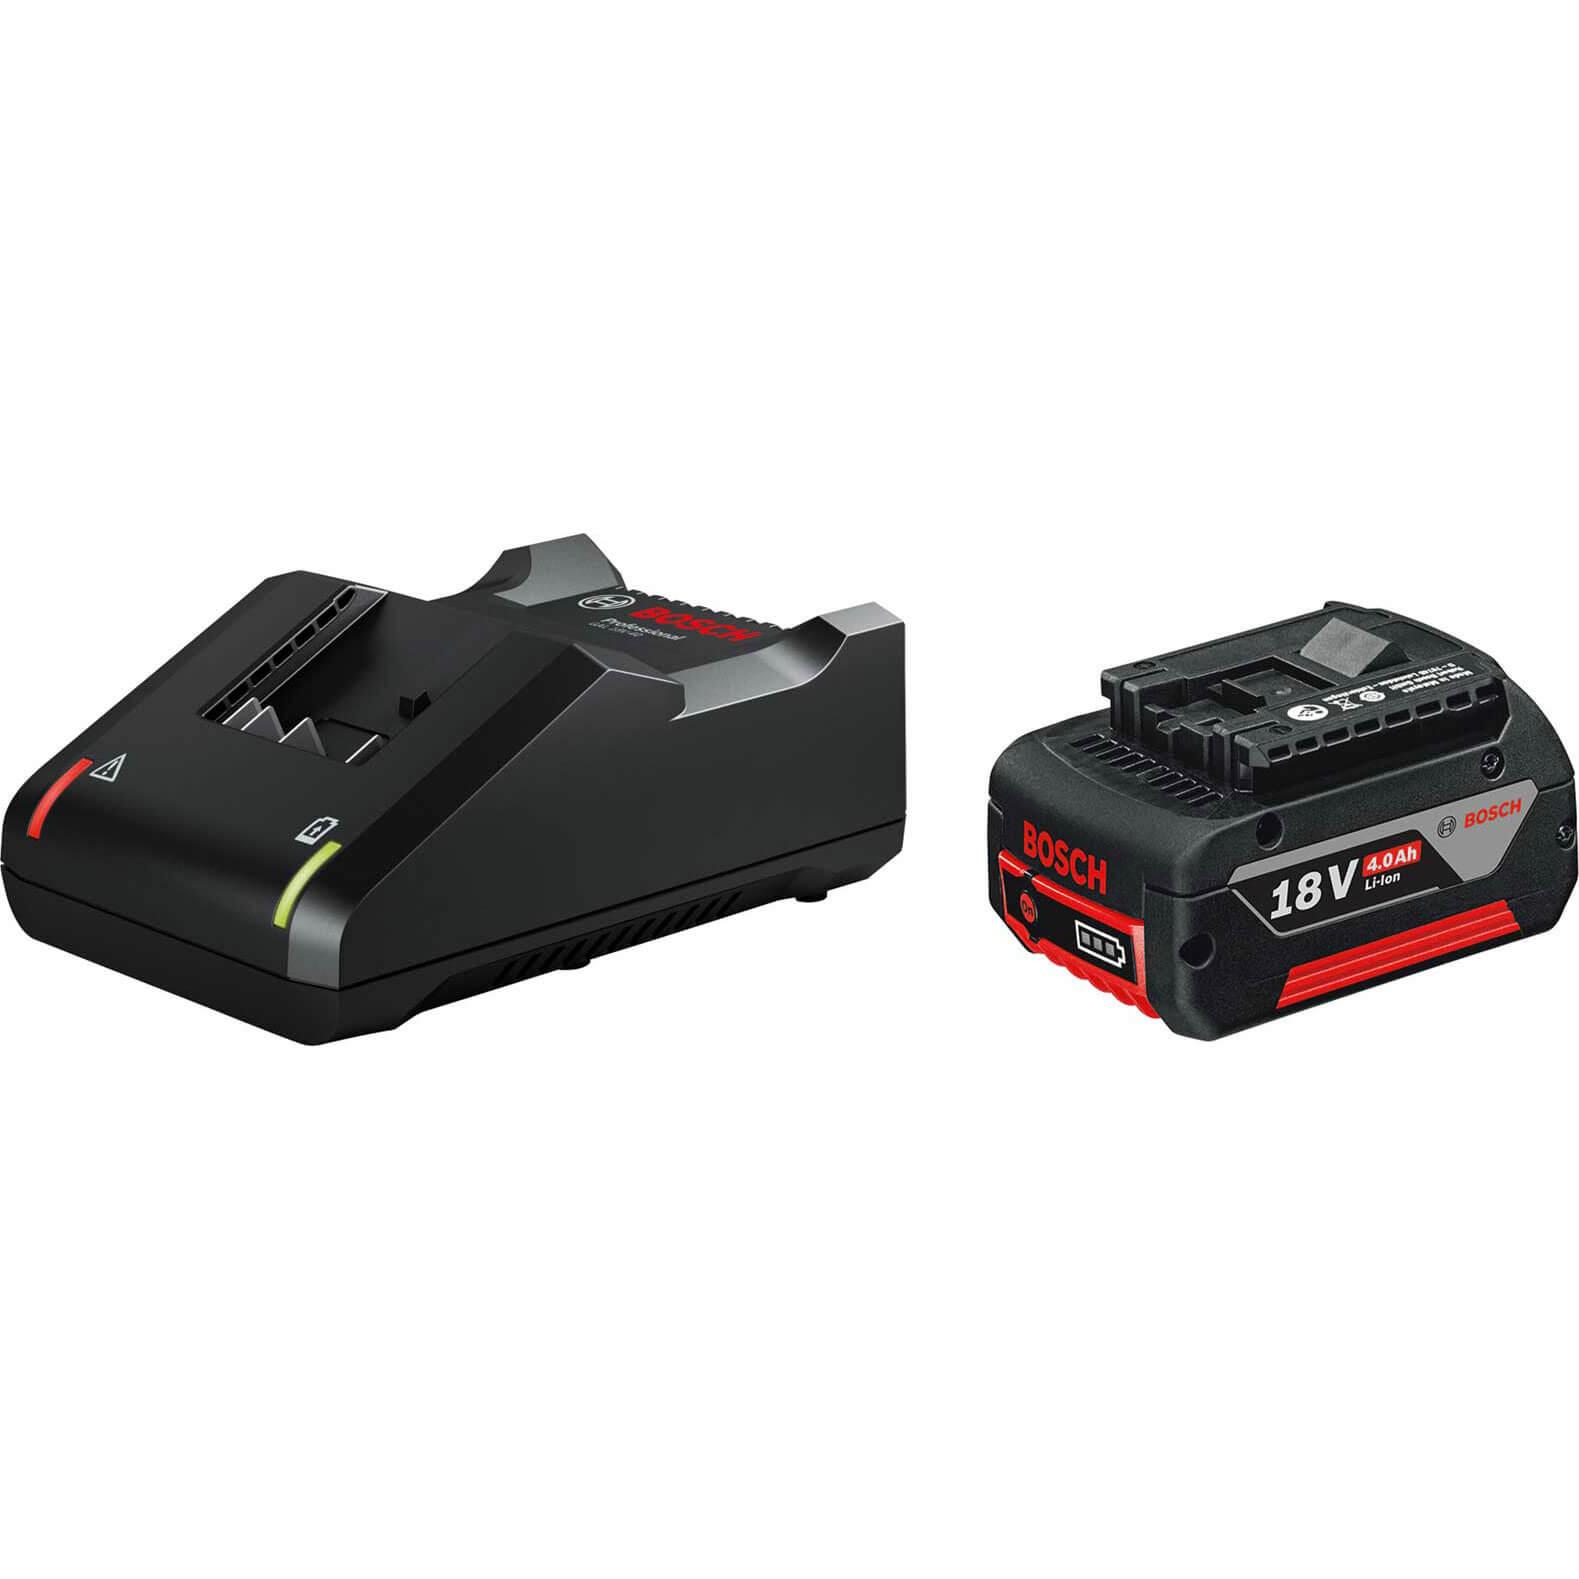 Bosch PRO Genuine 18v Cordless Li ion Battery 4ah and